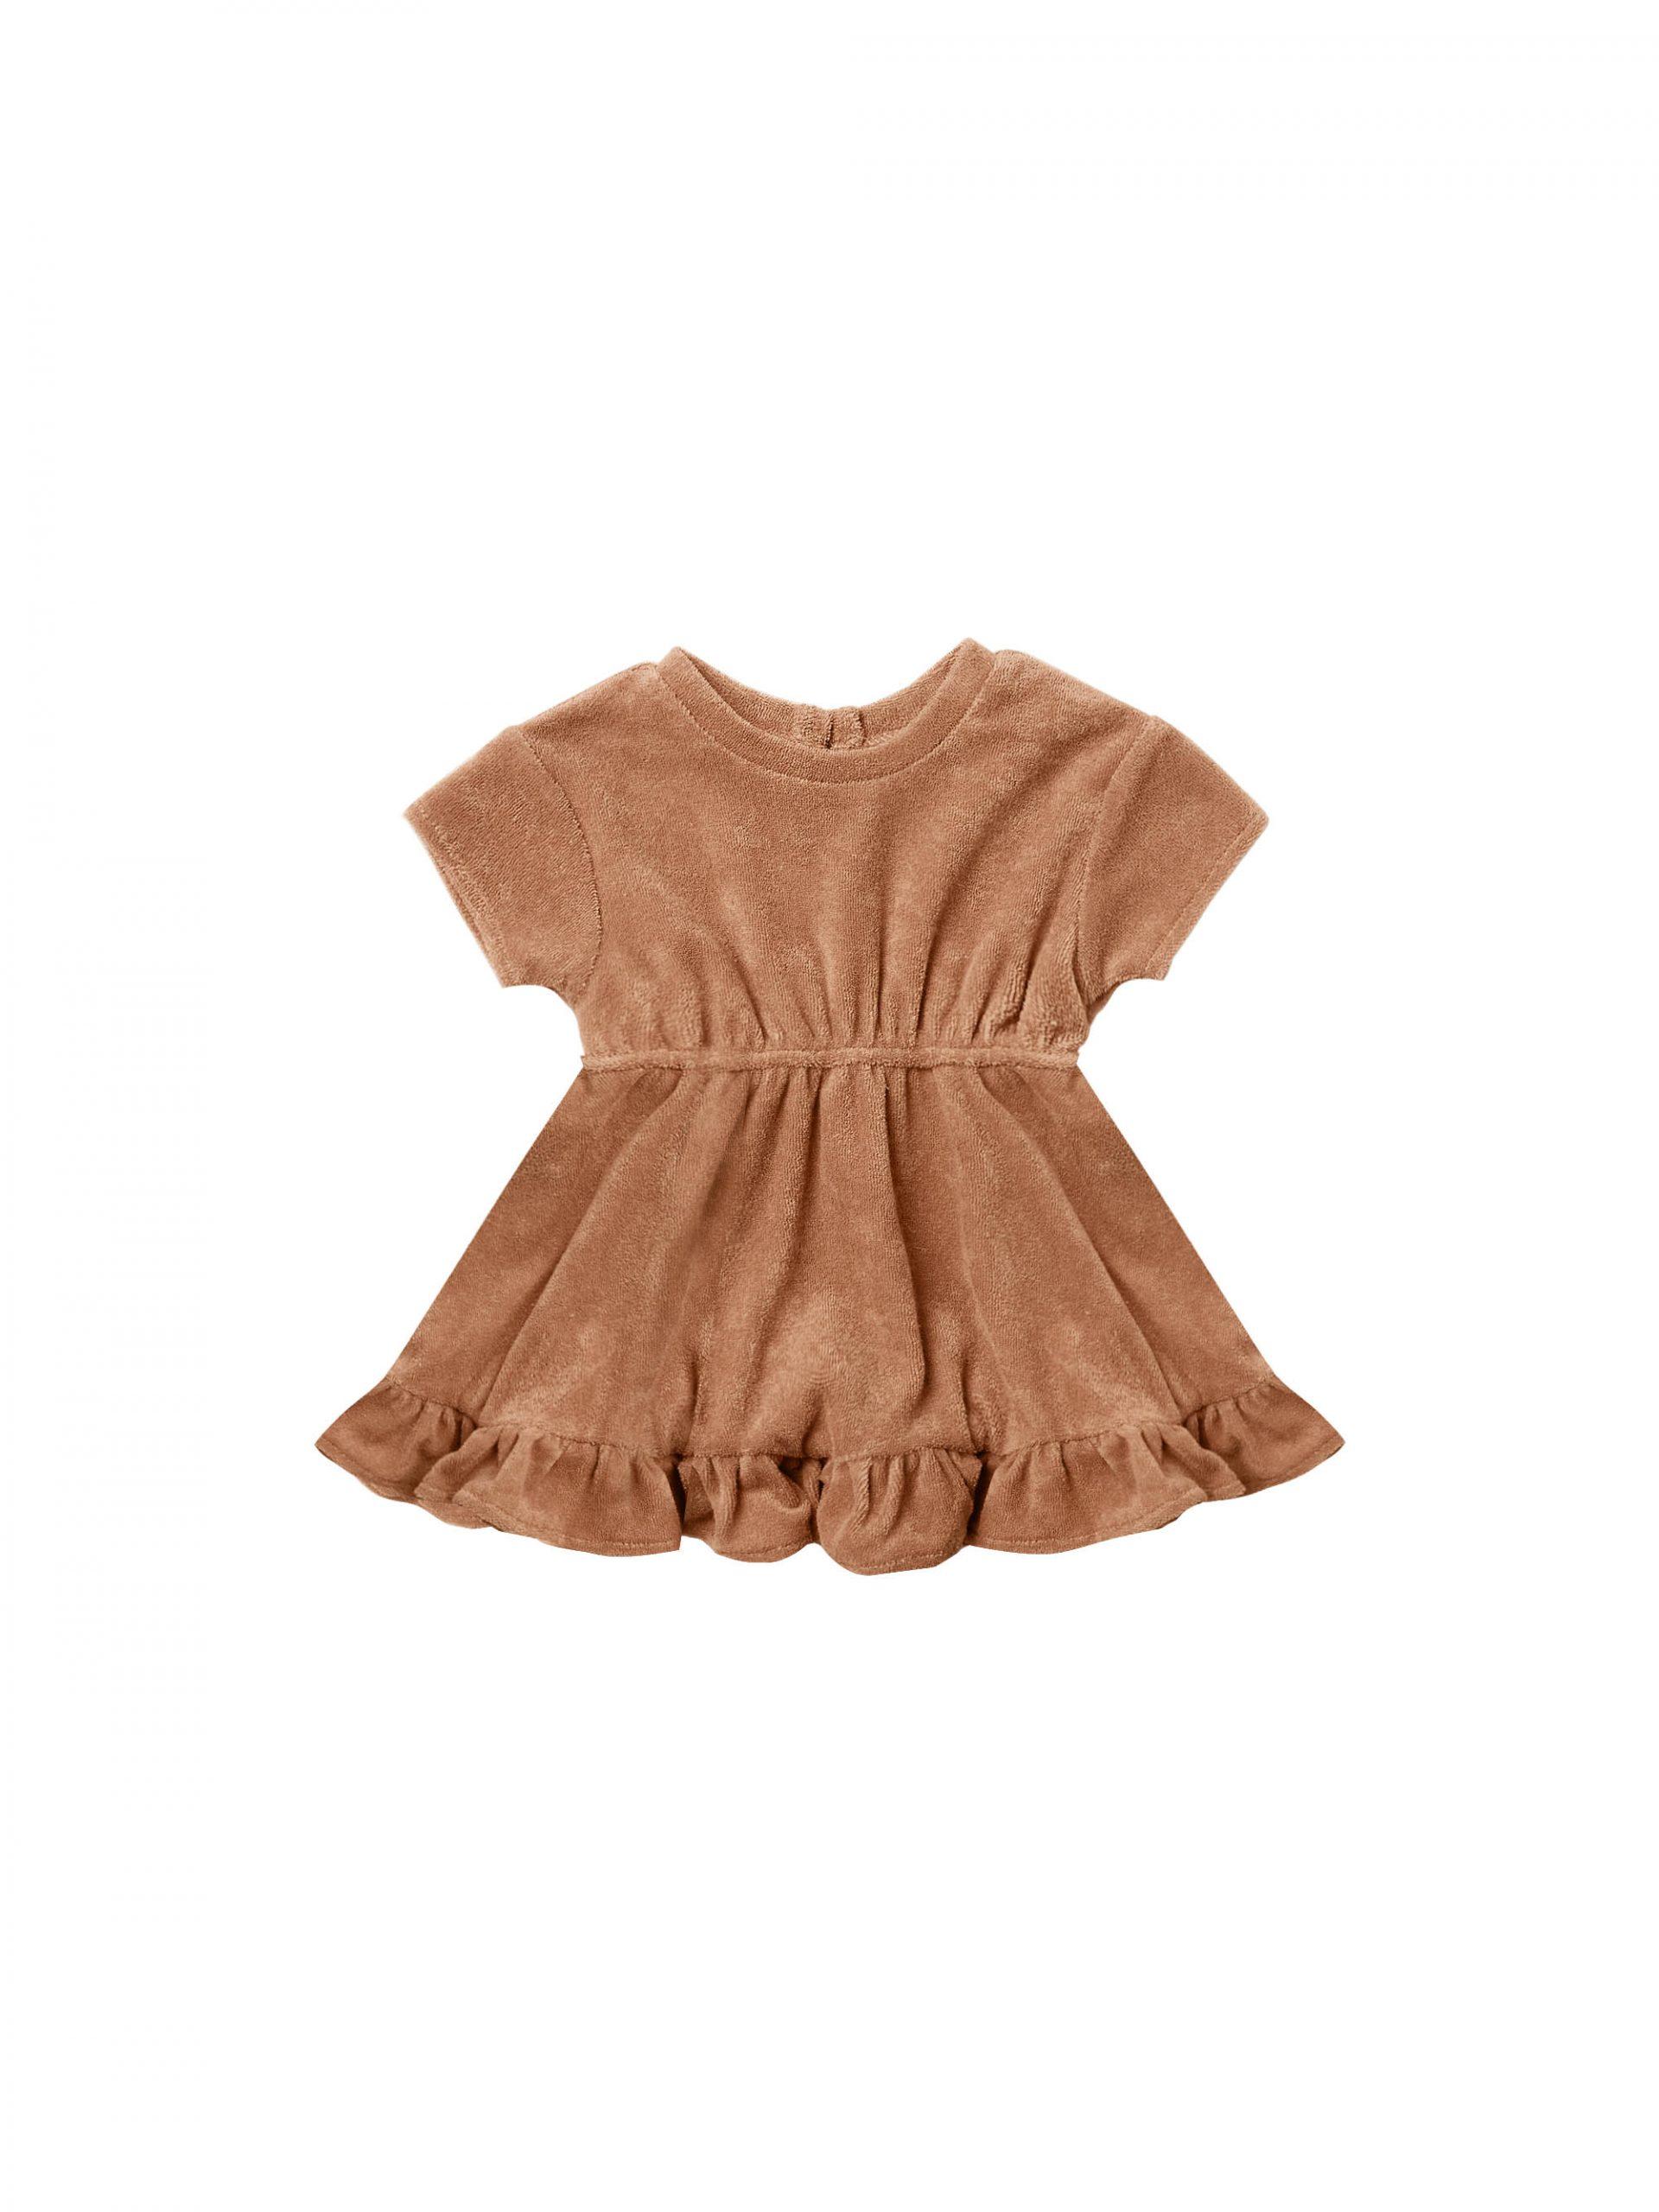 Quincy Mae Terry Dress + Bloomer Set (terracotta)